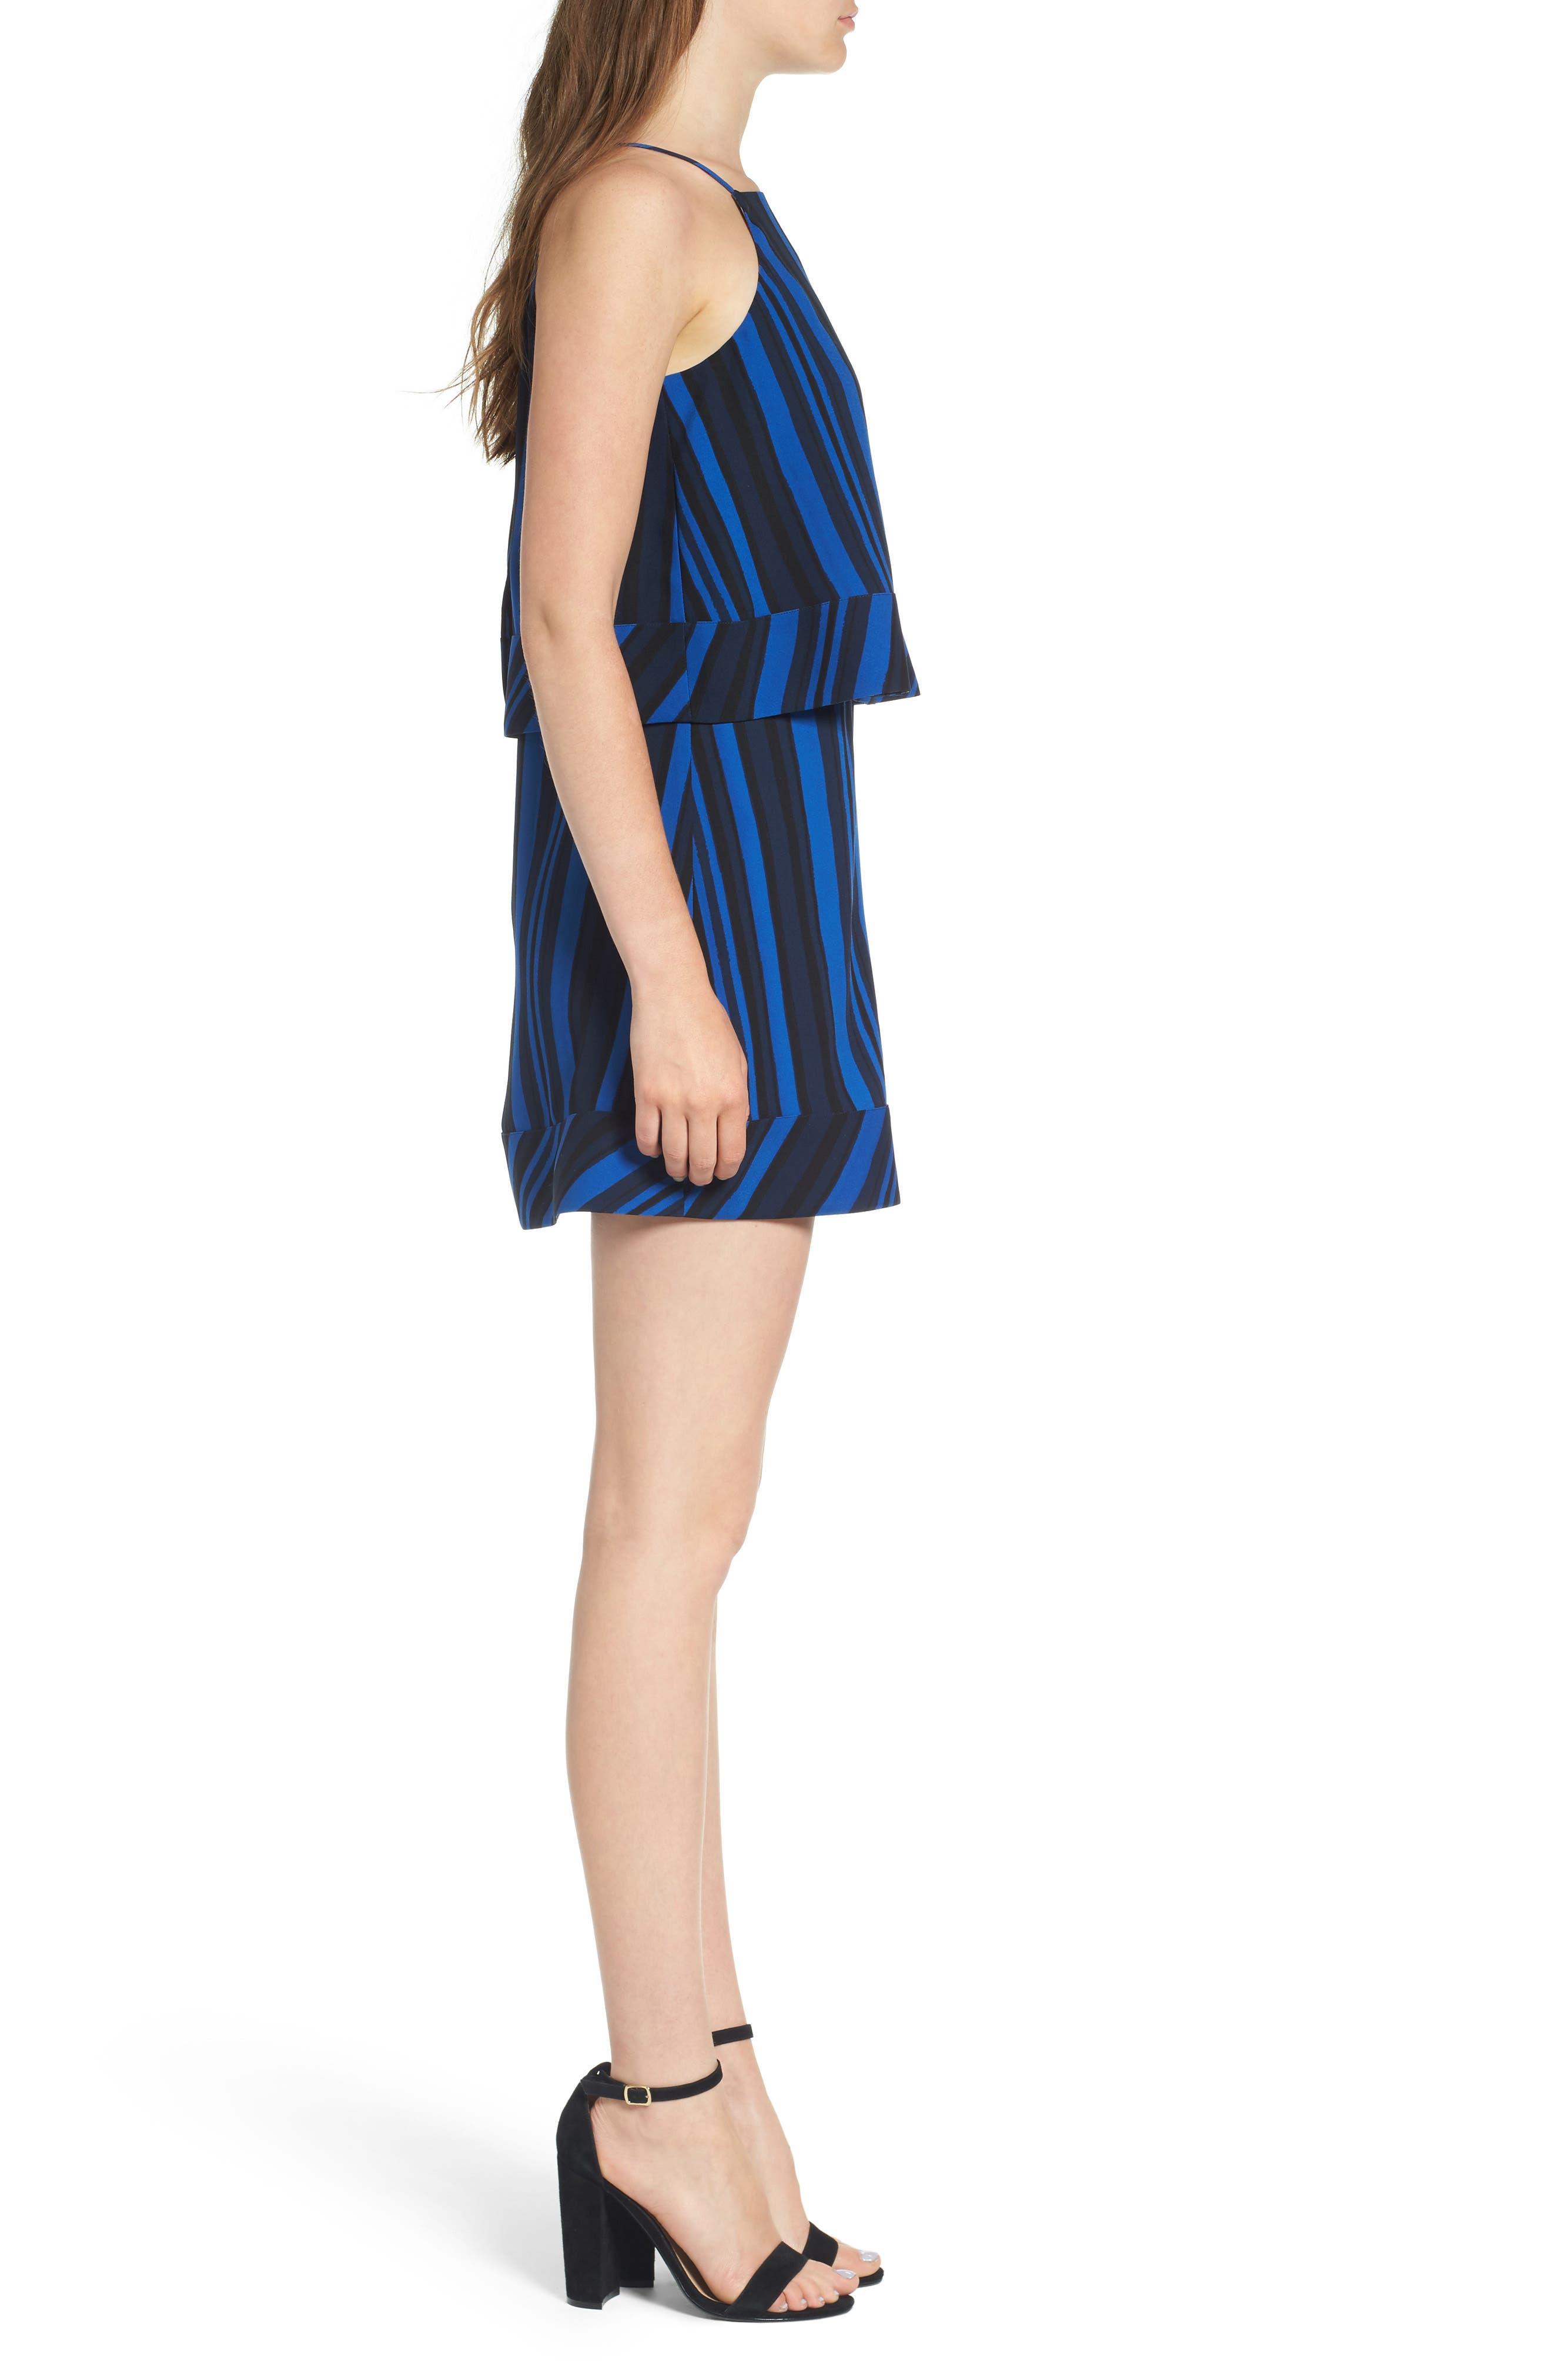 Callie Tiered Shift Dress,                             Alternate thumbnail 3, color,                             Blue Stripe Print